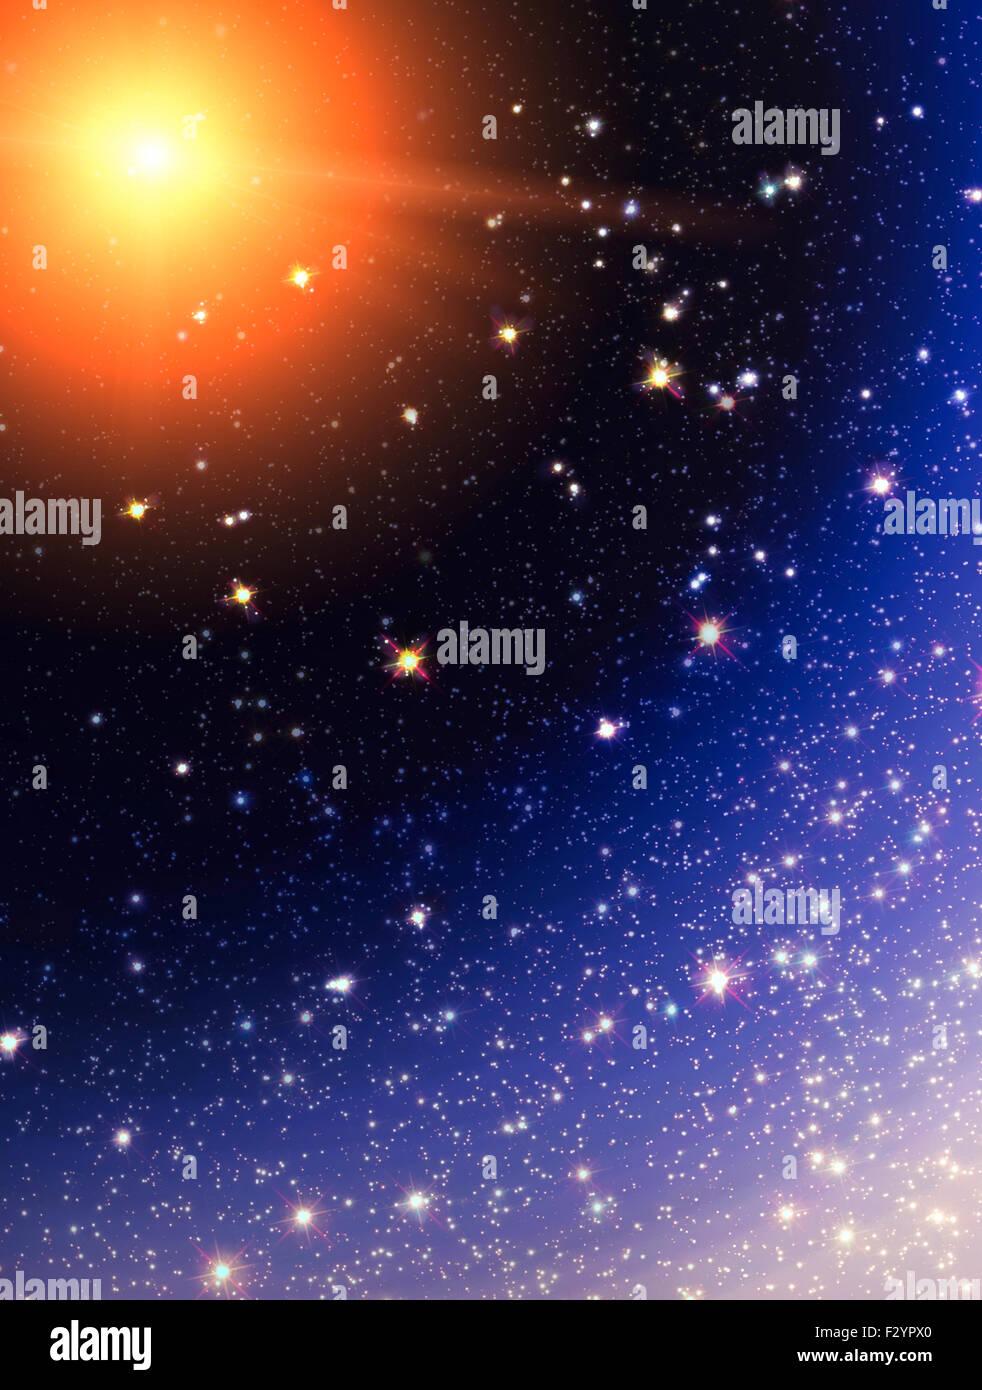 Stars de fond, la texture de l'espace avec de nombreuses stars Photo Stock